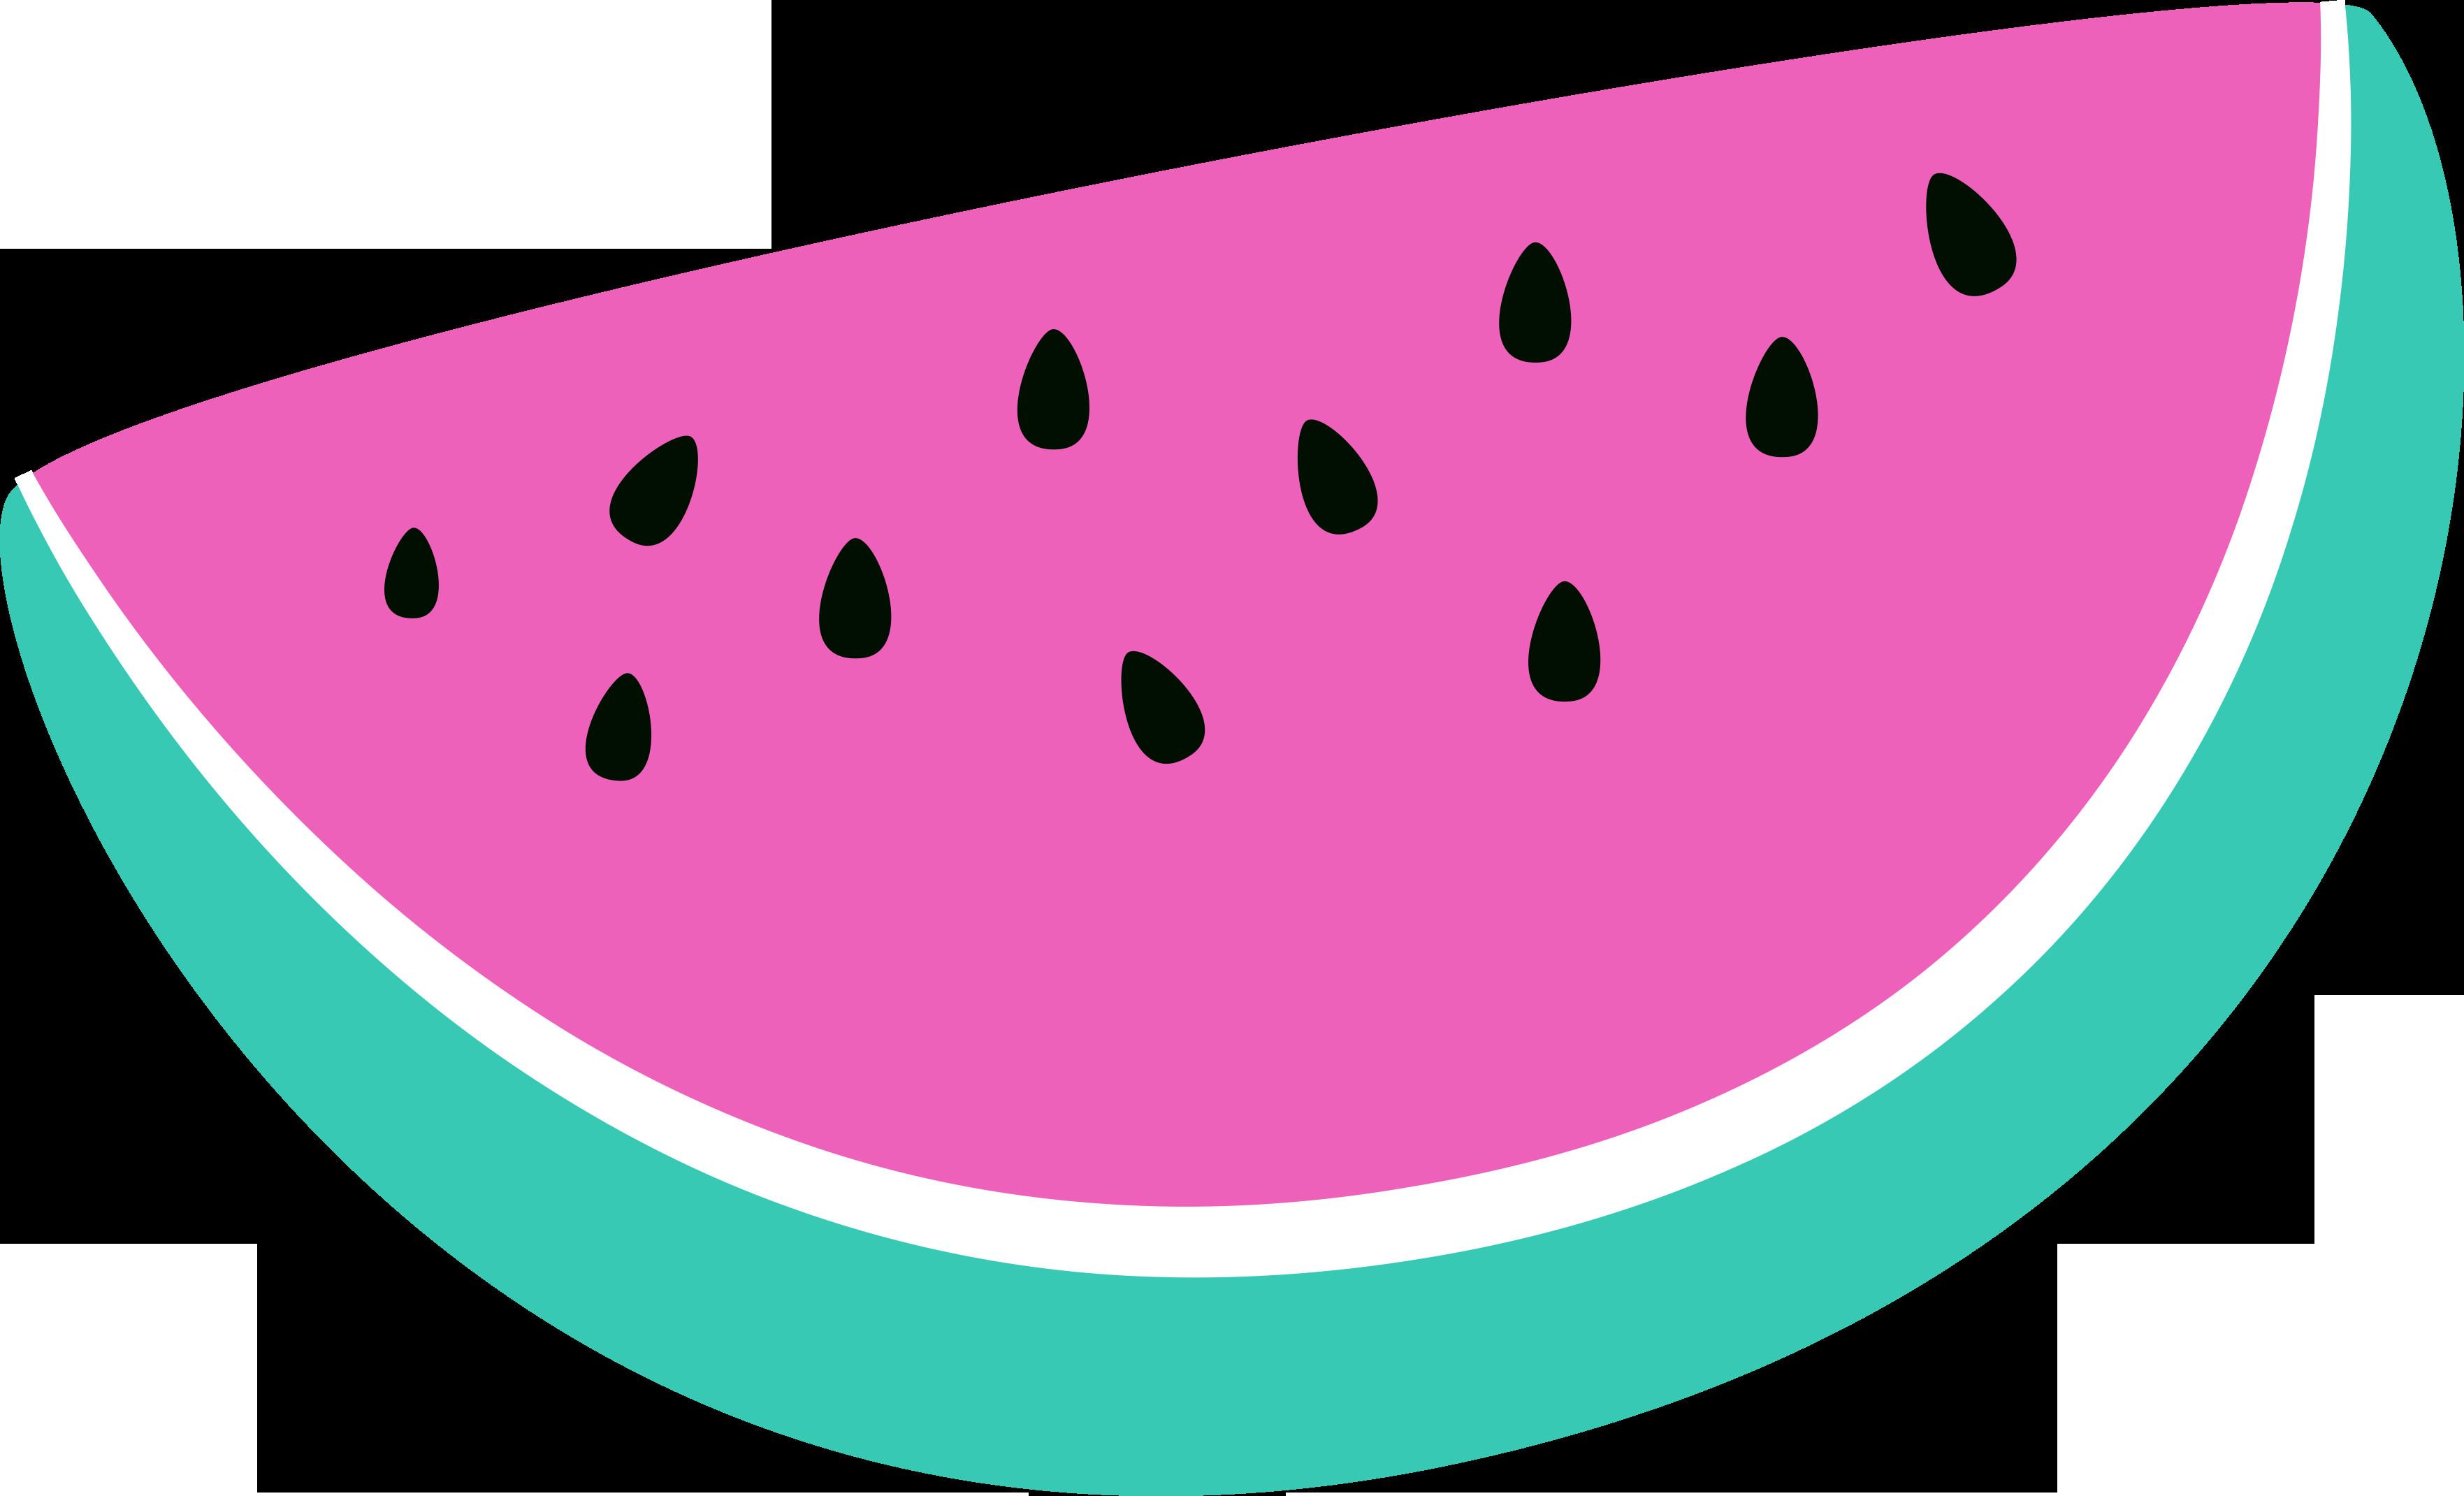 3526x2141 Free Clipart For Summer Fun